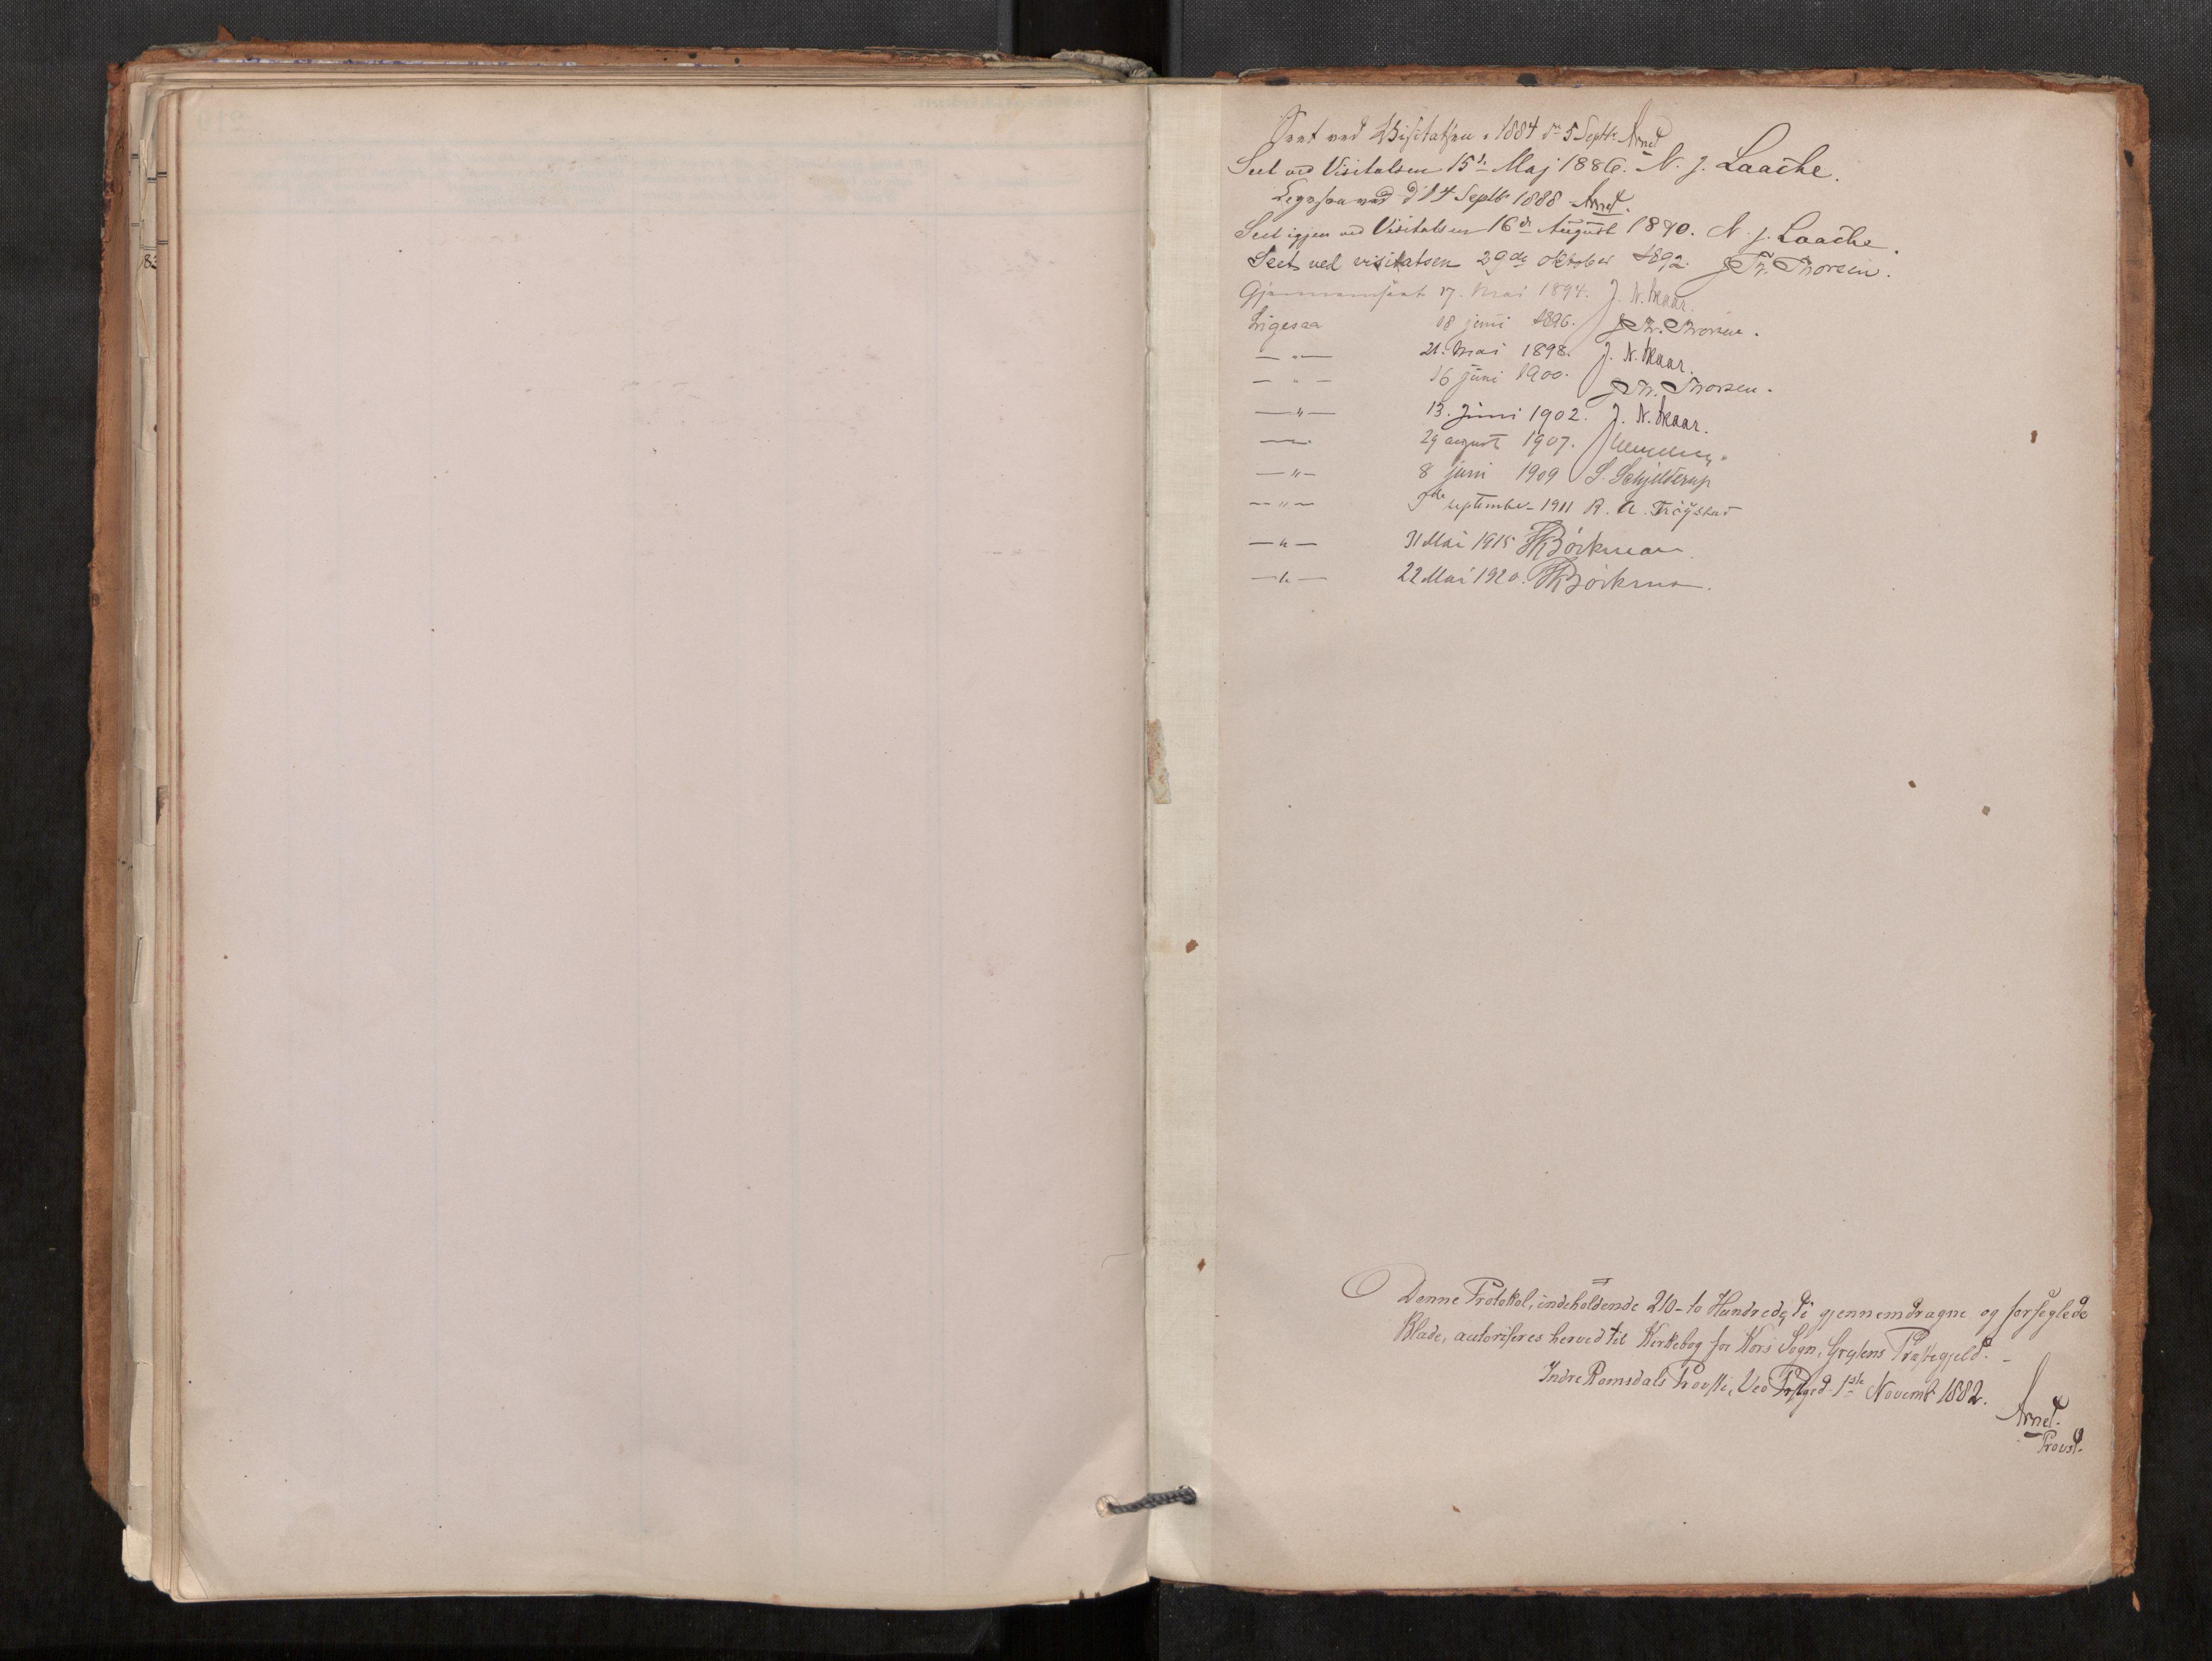 SAT, Grytten sokneprestkontor, Ministerialbok nr. 546A03, 1882-1920